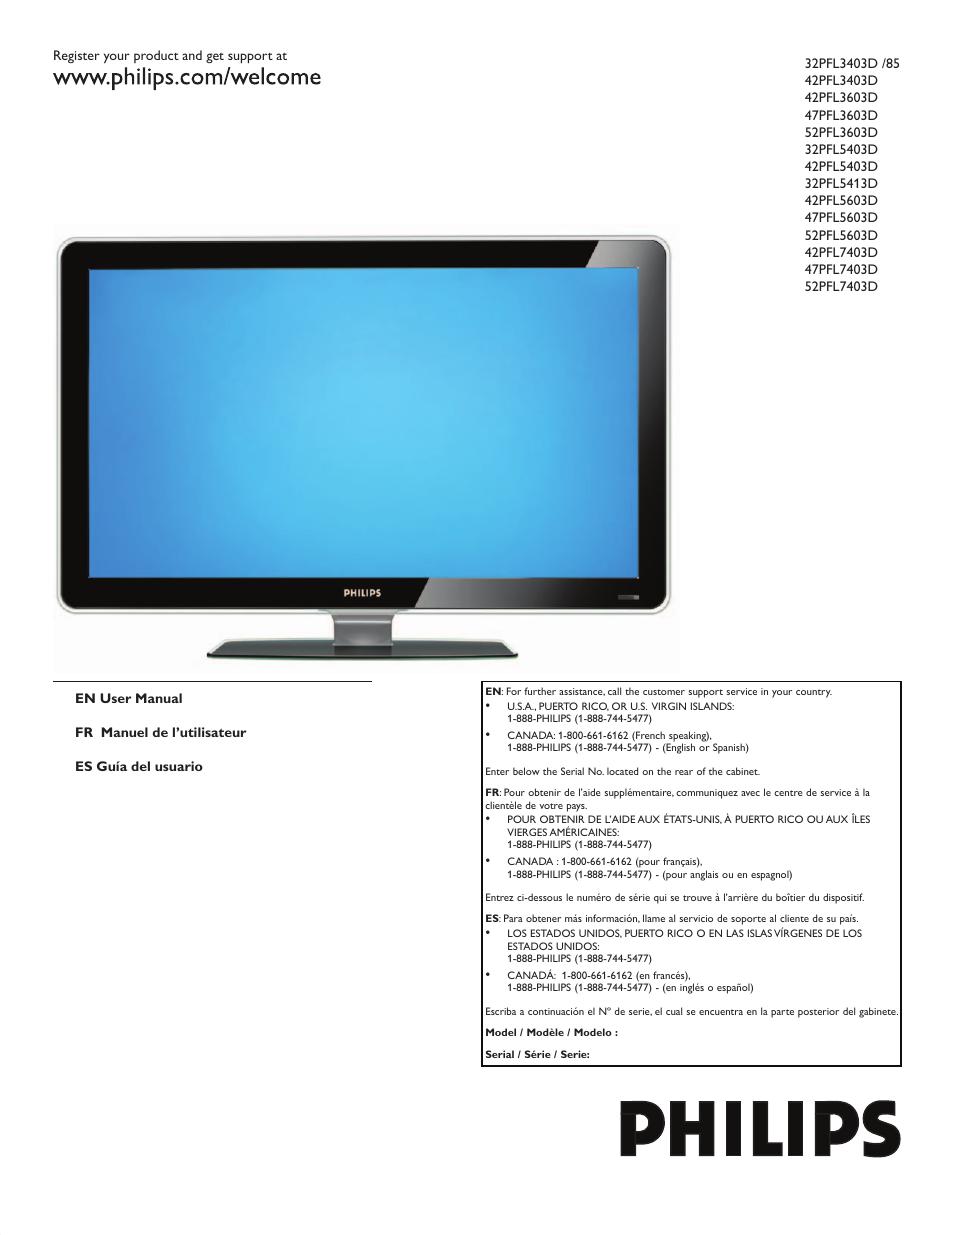 philips 42pfl5603d f7 user manual 44 pages original mode also rh manualsdir com